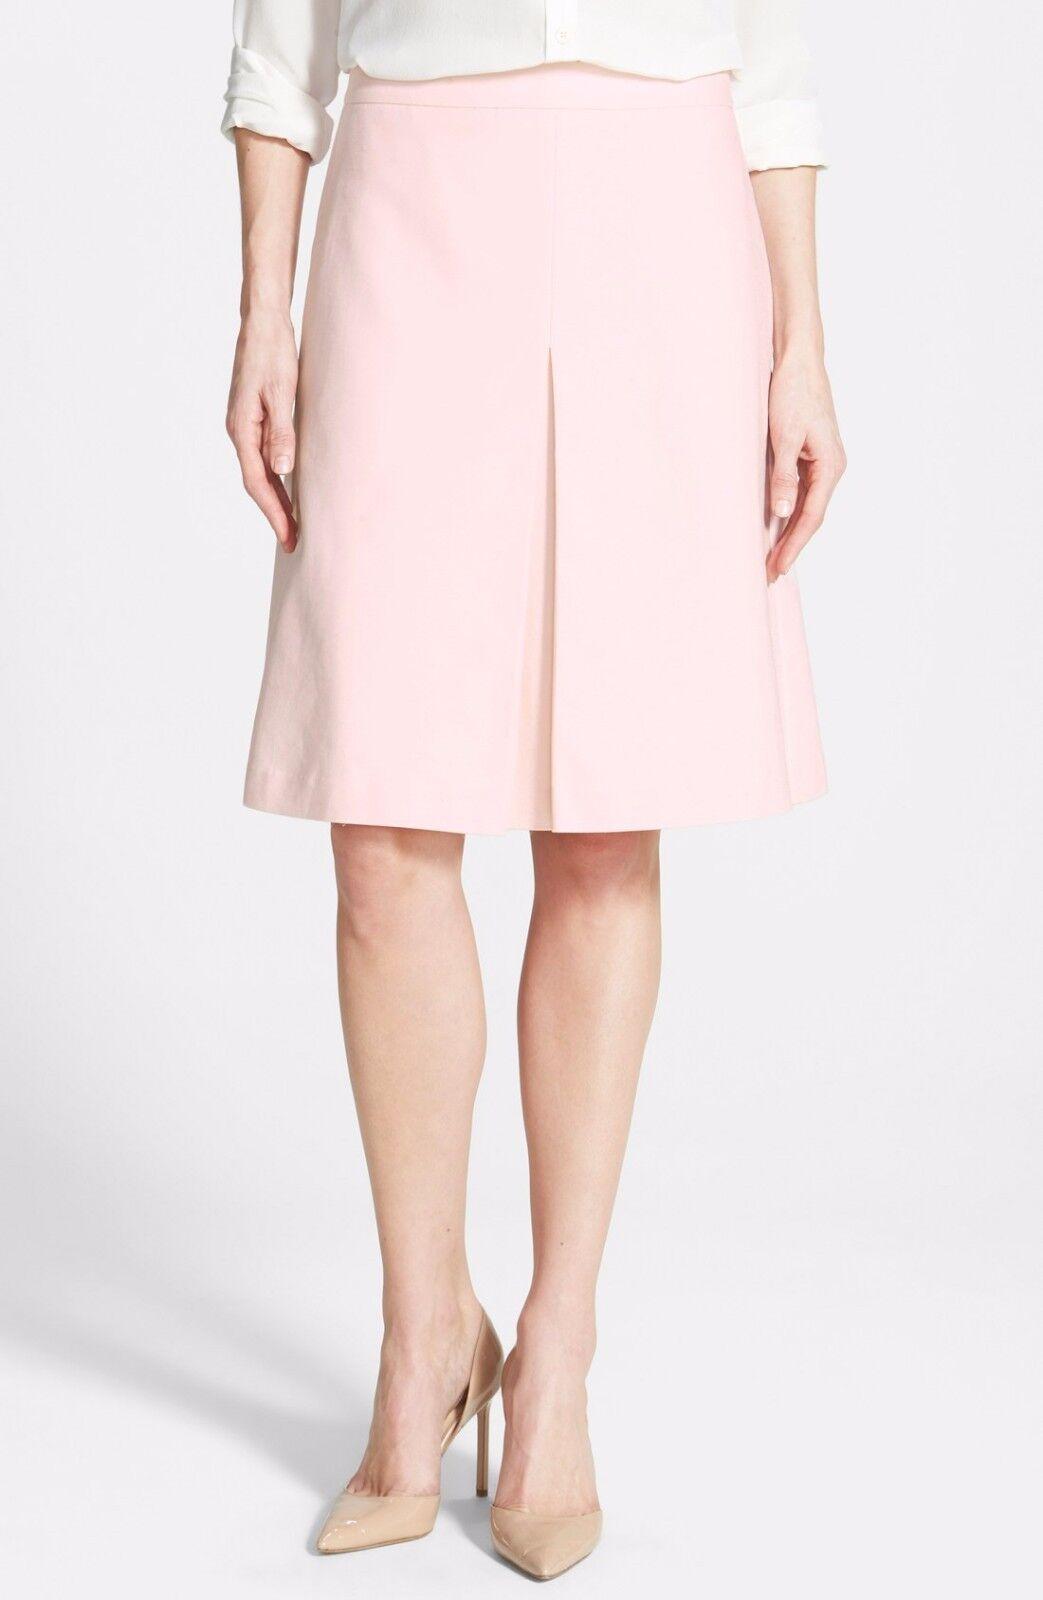 Womens petite size skirts — pic 8